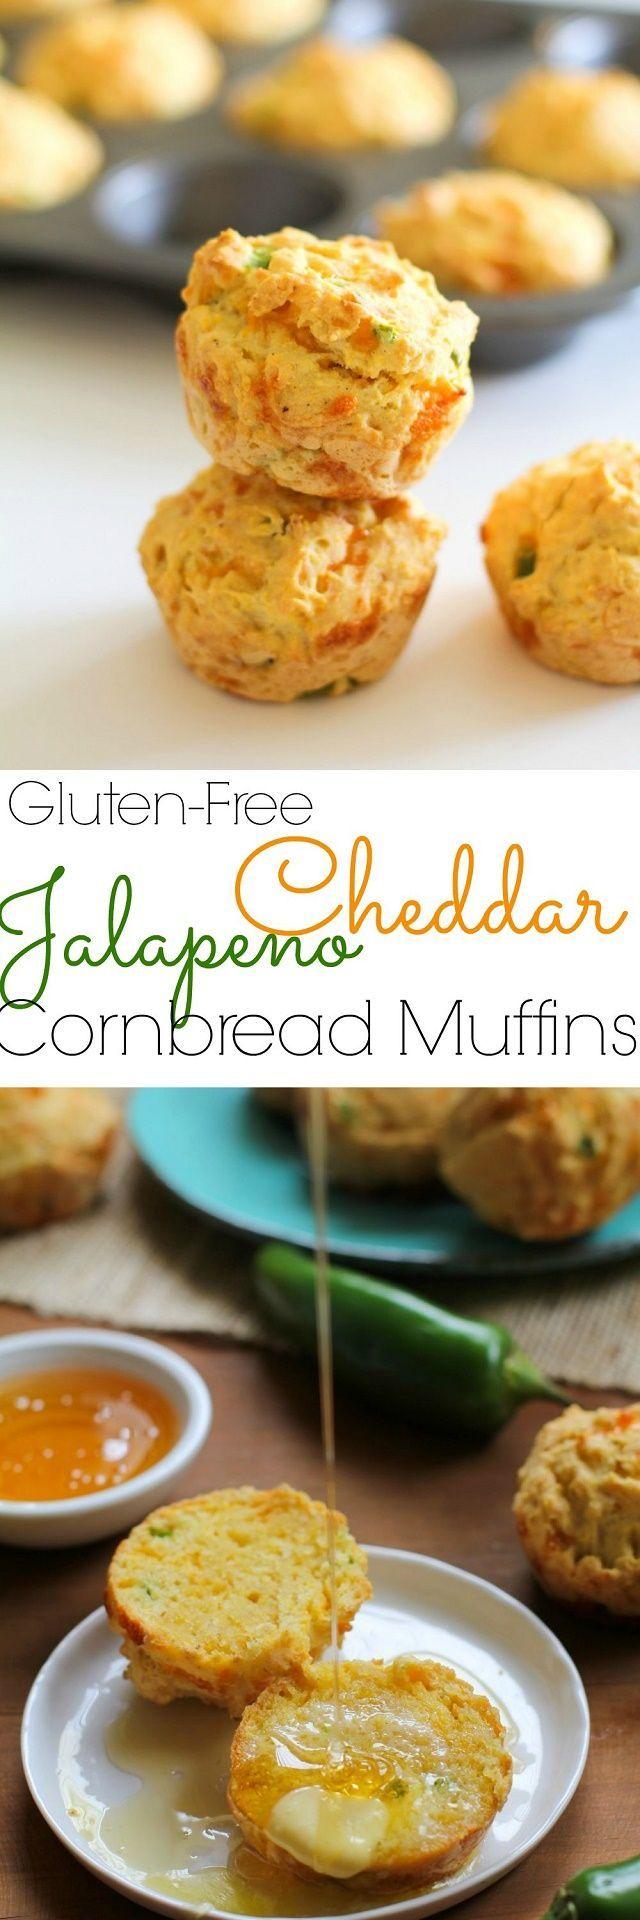 Gluten-Free Jalapeno Cheddar Cornbread Muffins   TheRoastedRoot.net #recipe @bobsredmill